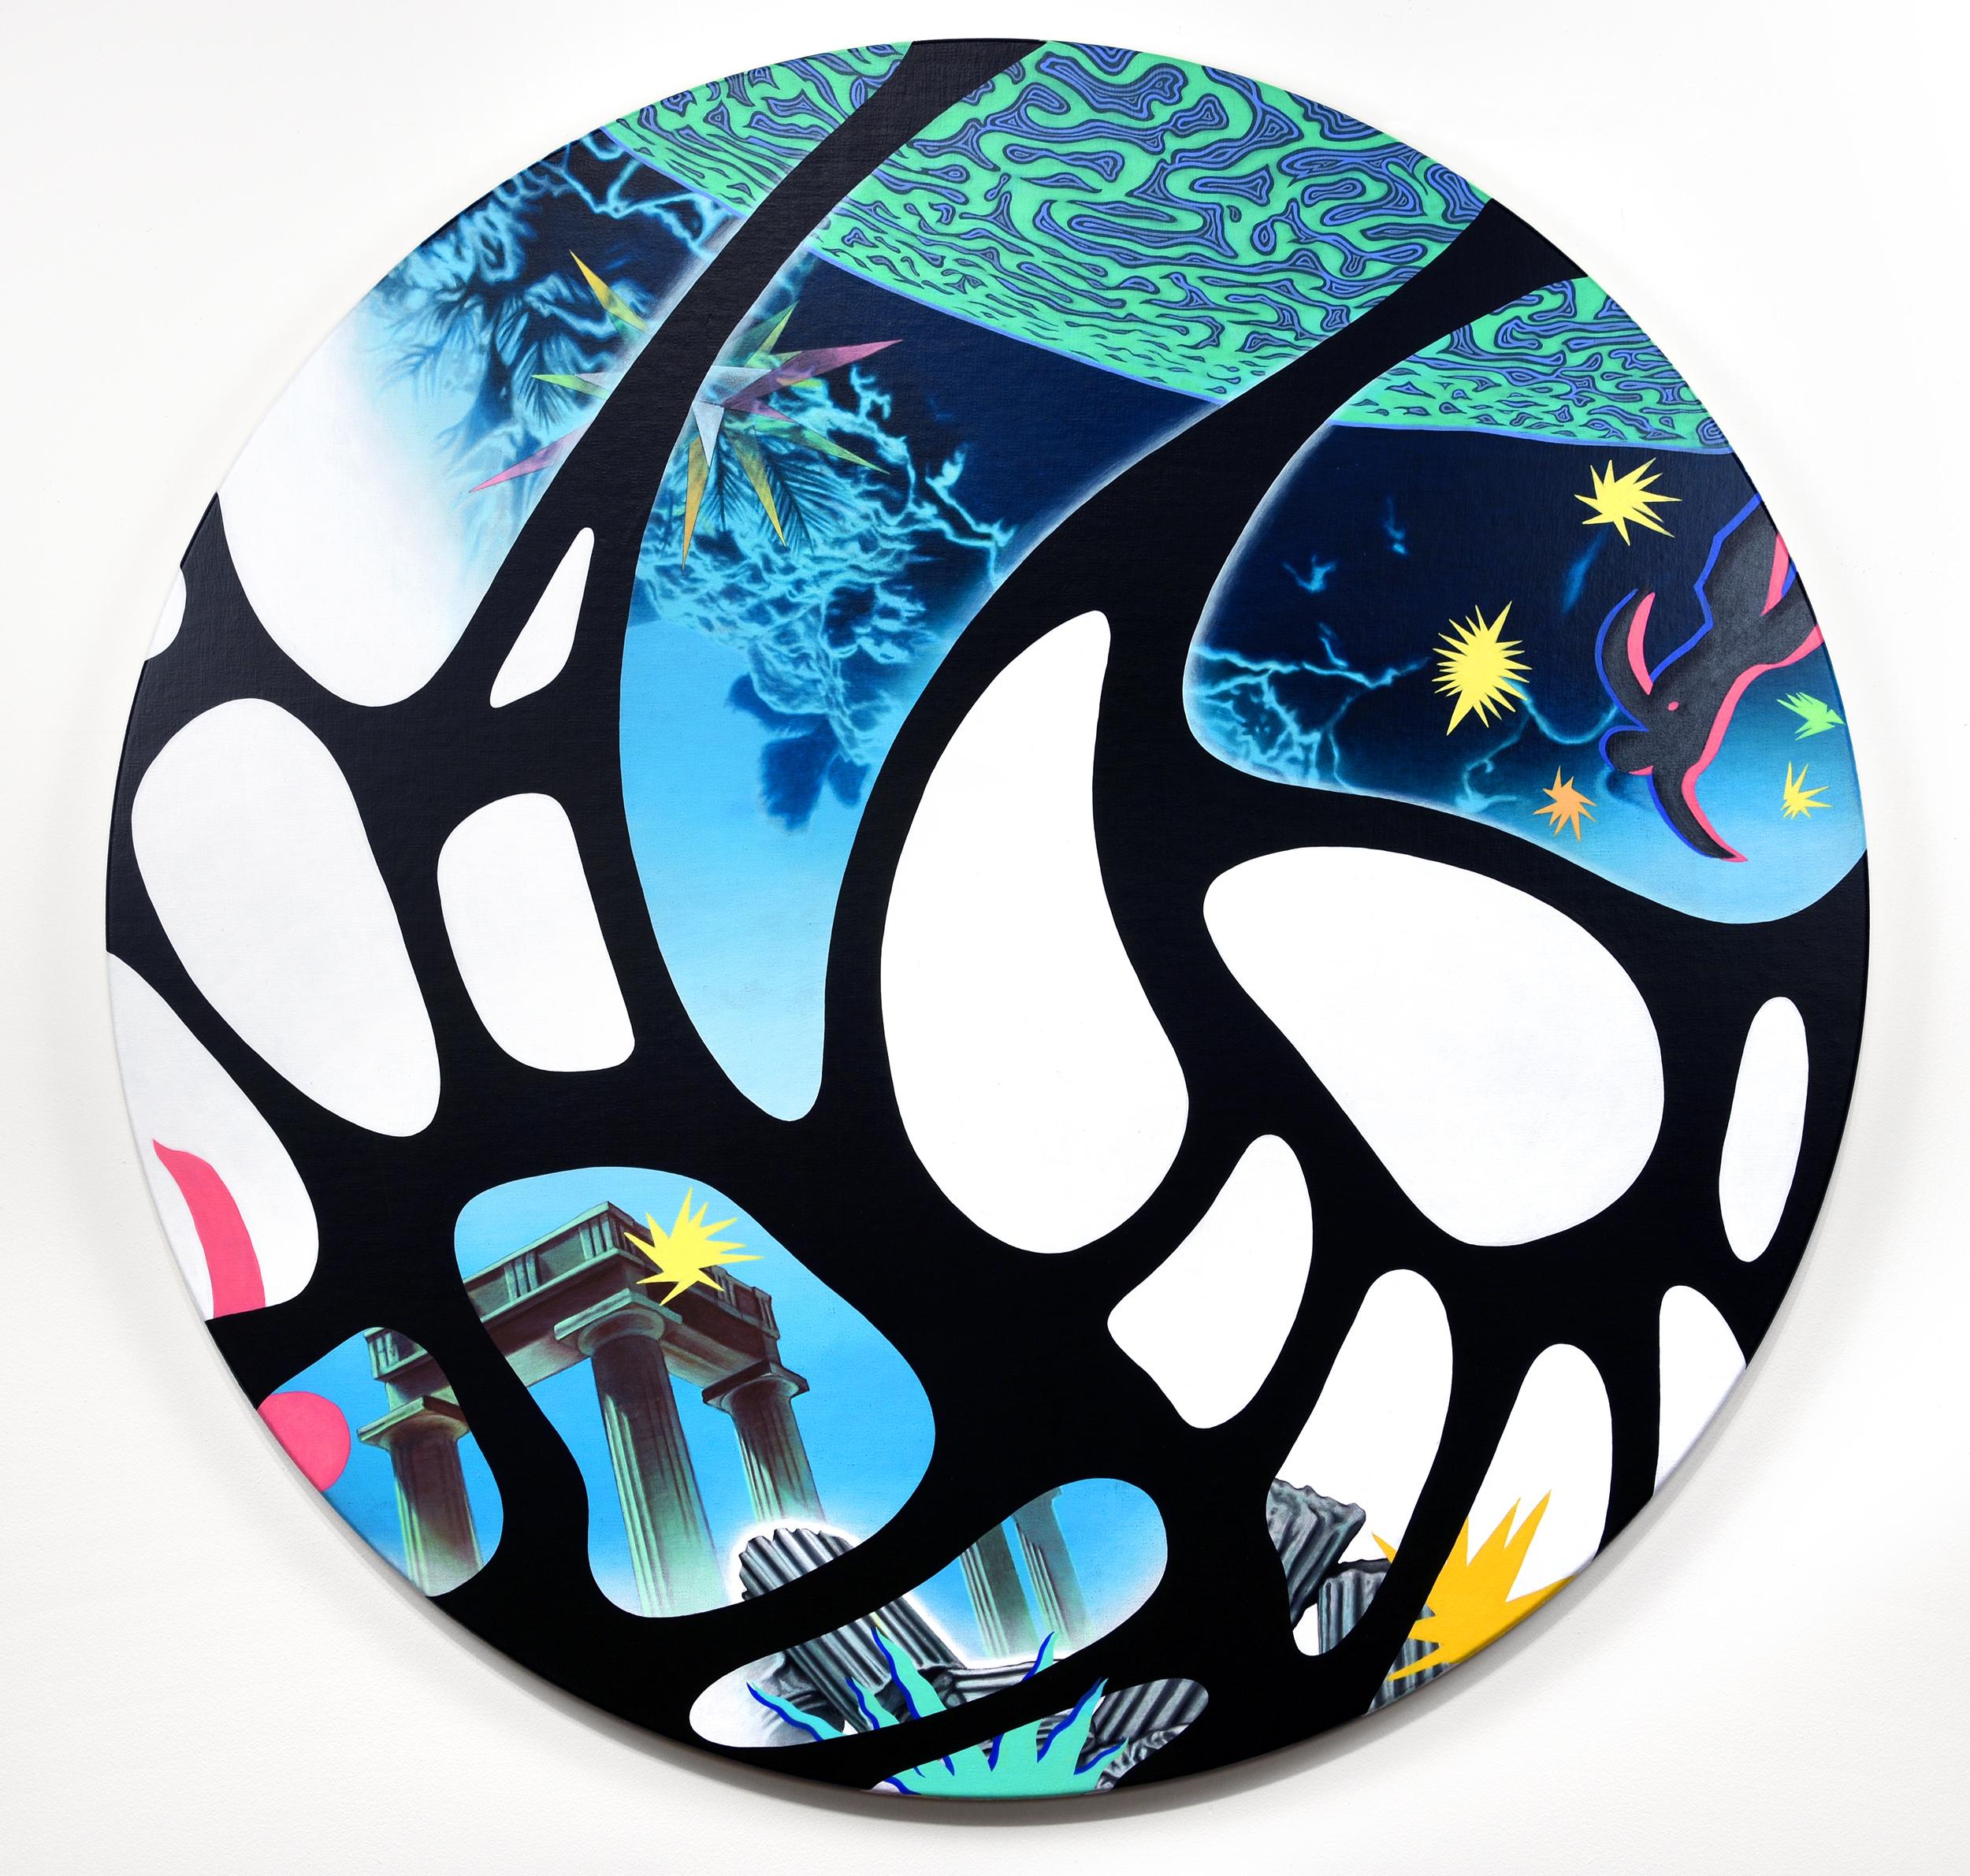 Peter D. Gerakaris ,  Ventana: Atlantis Tondo , 2017, acrylic on canvas over panel, 35 in. diameter